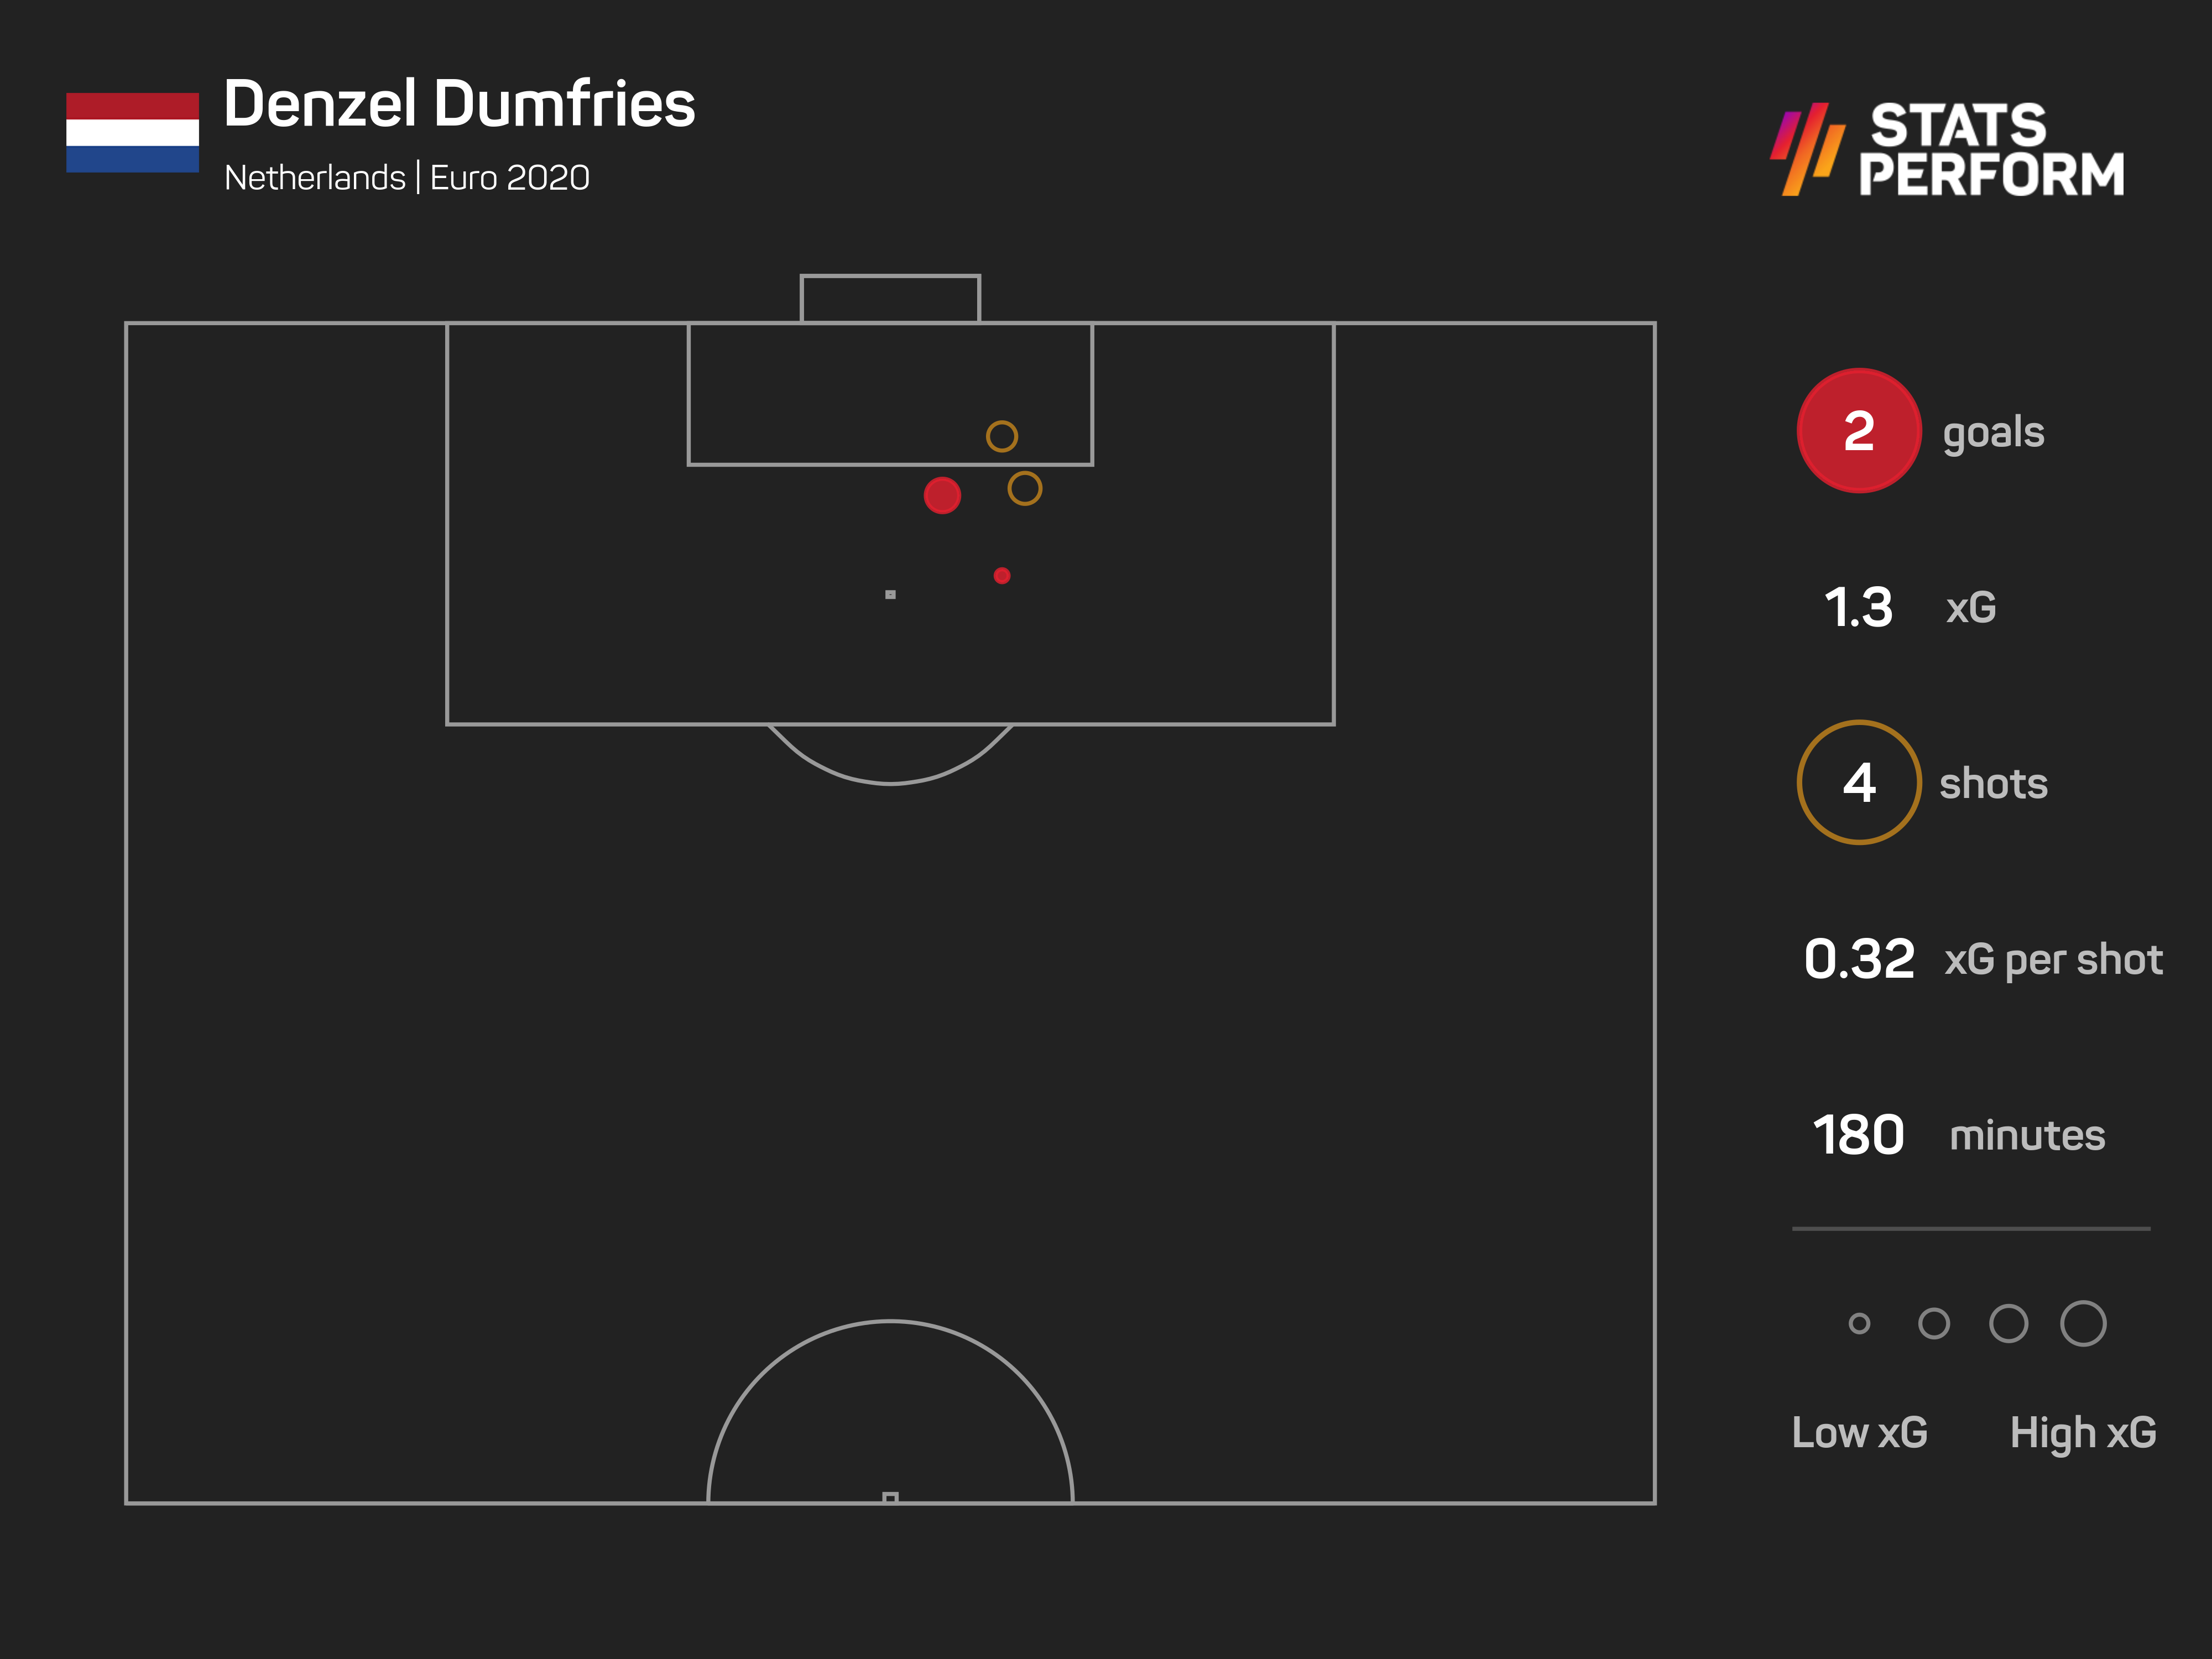 Denzel Dumfries xG at Euro 2020